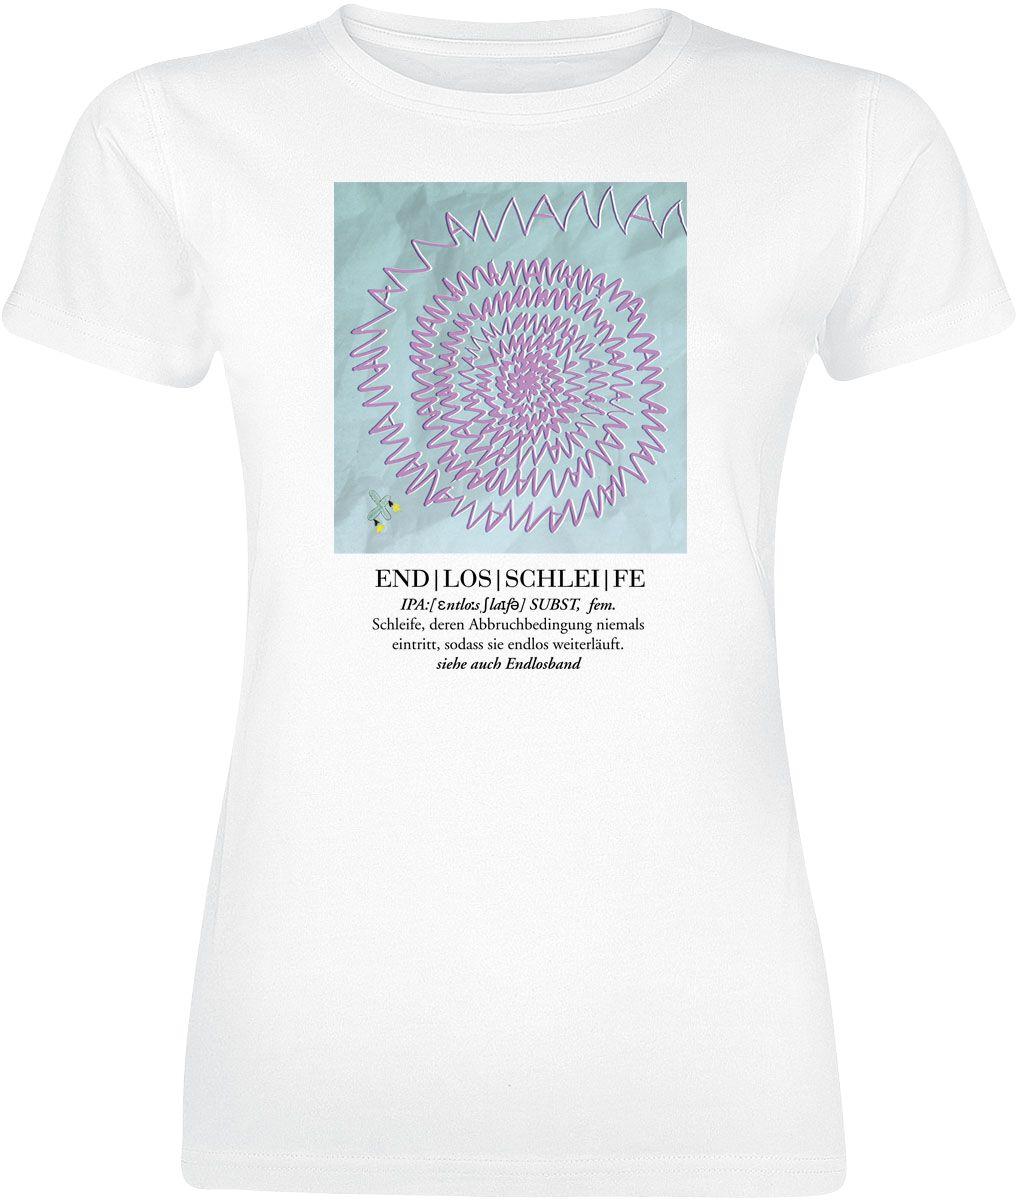 RackaArtz Endlosschleife T-Shirt weiß POD - FOTL VW - Endlosschleife